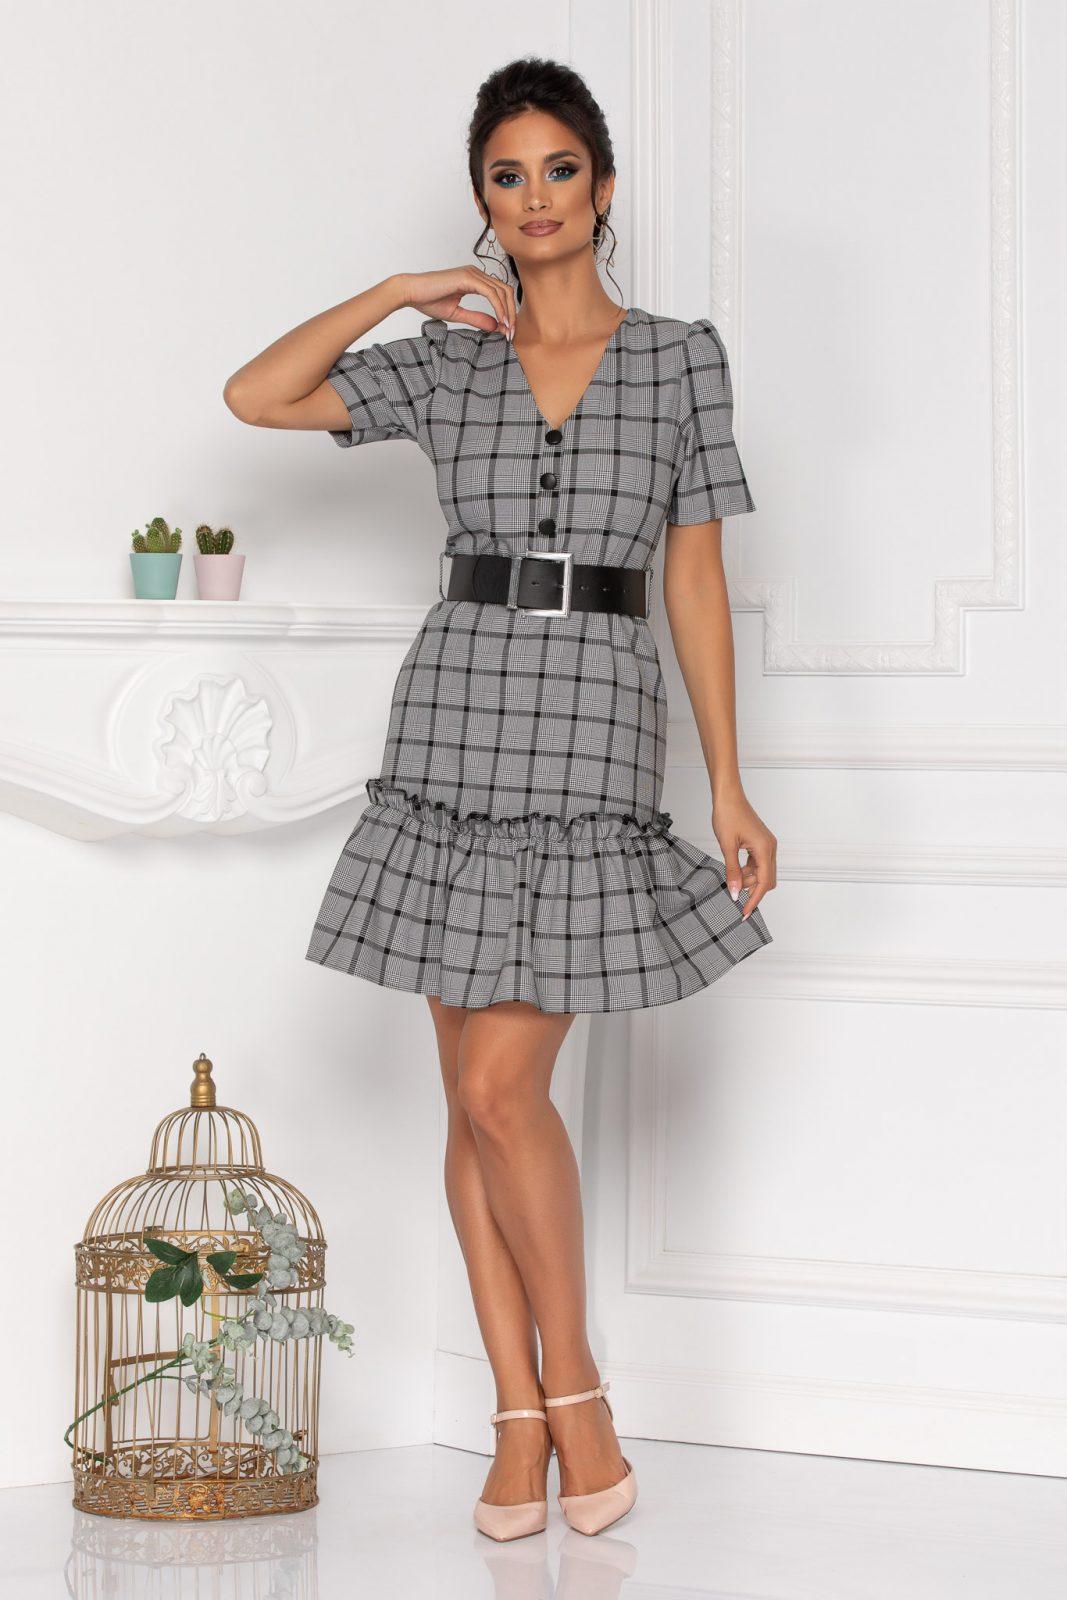 Alexis Gray Dress